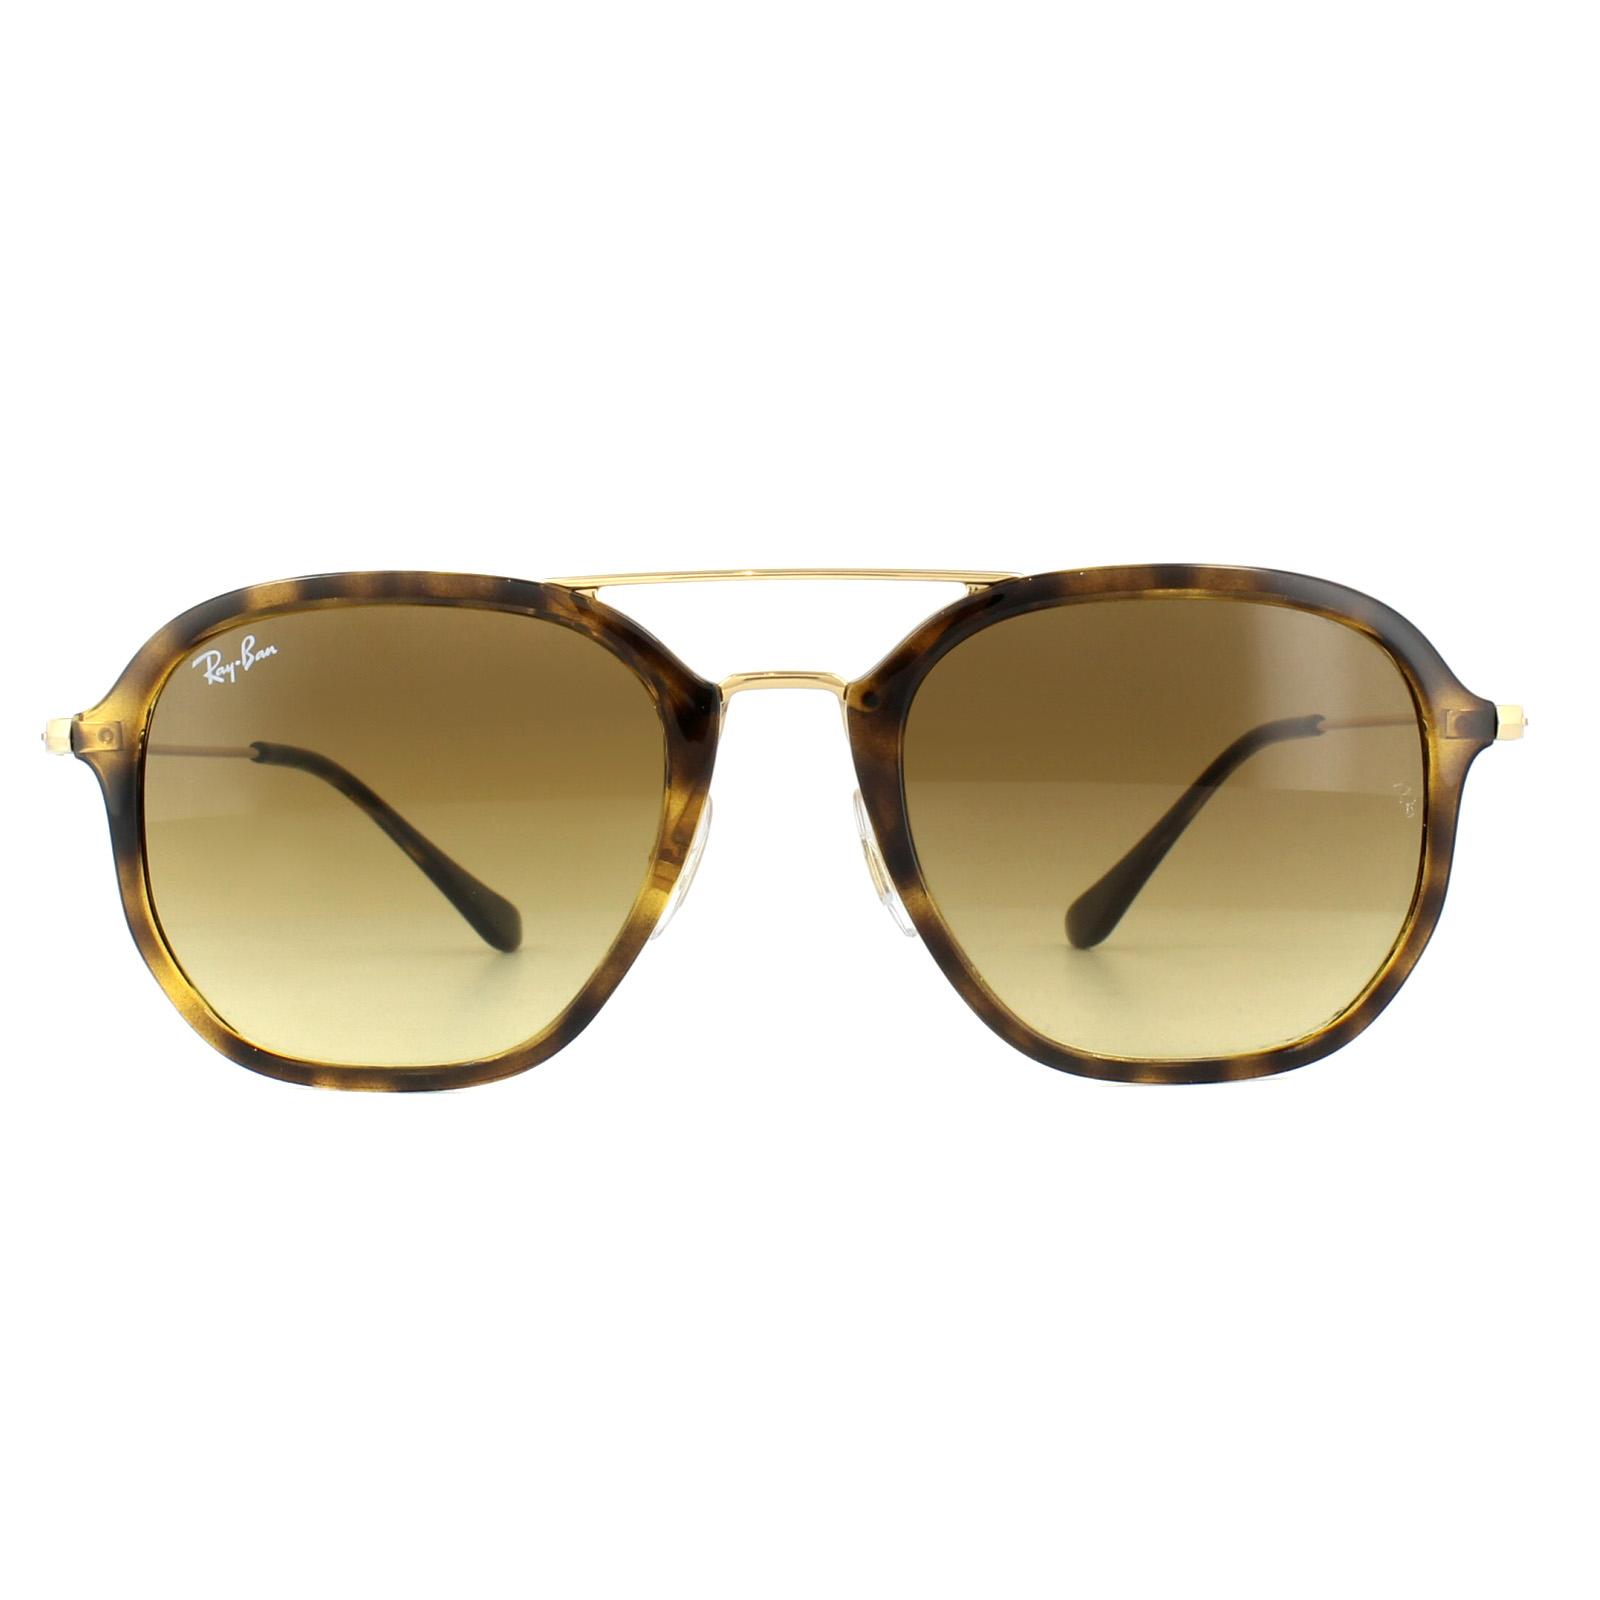 abba297e557 Sentinel Ray-Ban Sunglasses 4273 710 85 Tortoise Gold Brown Gradient